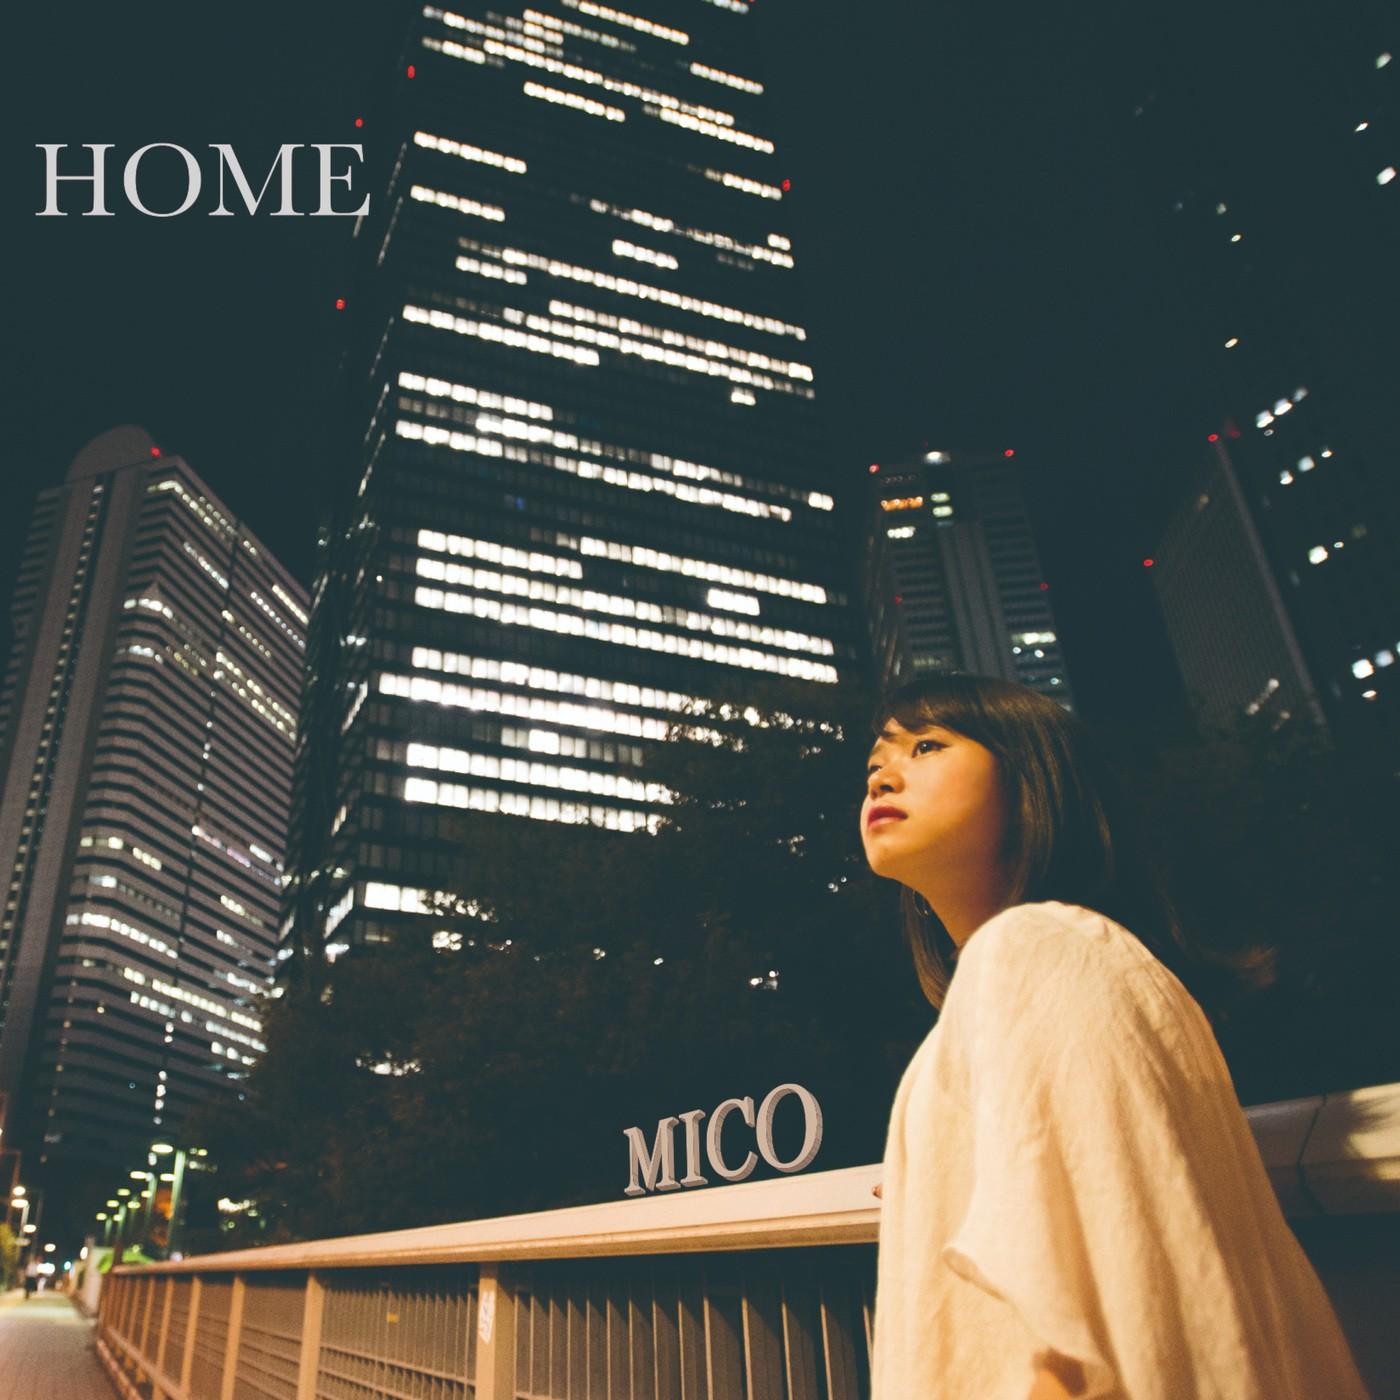 MICO – HOME [FLAC + MP3 320 / WEB] [2018.11.11]